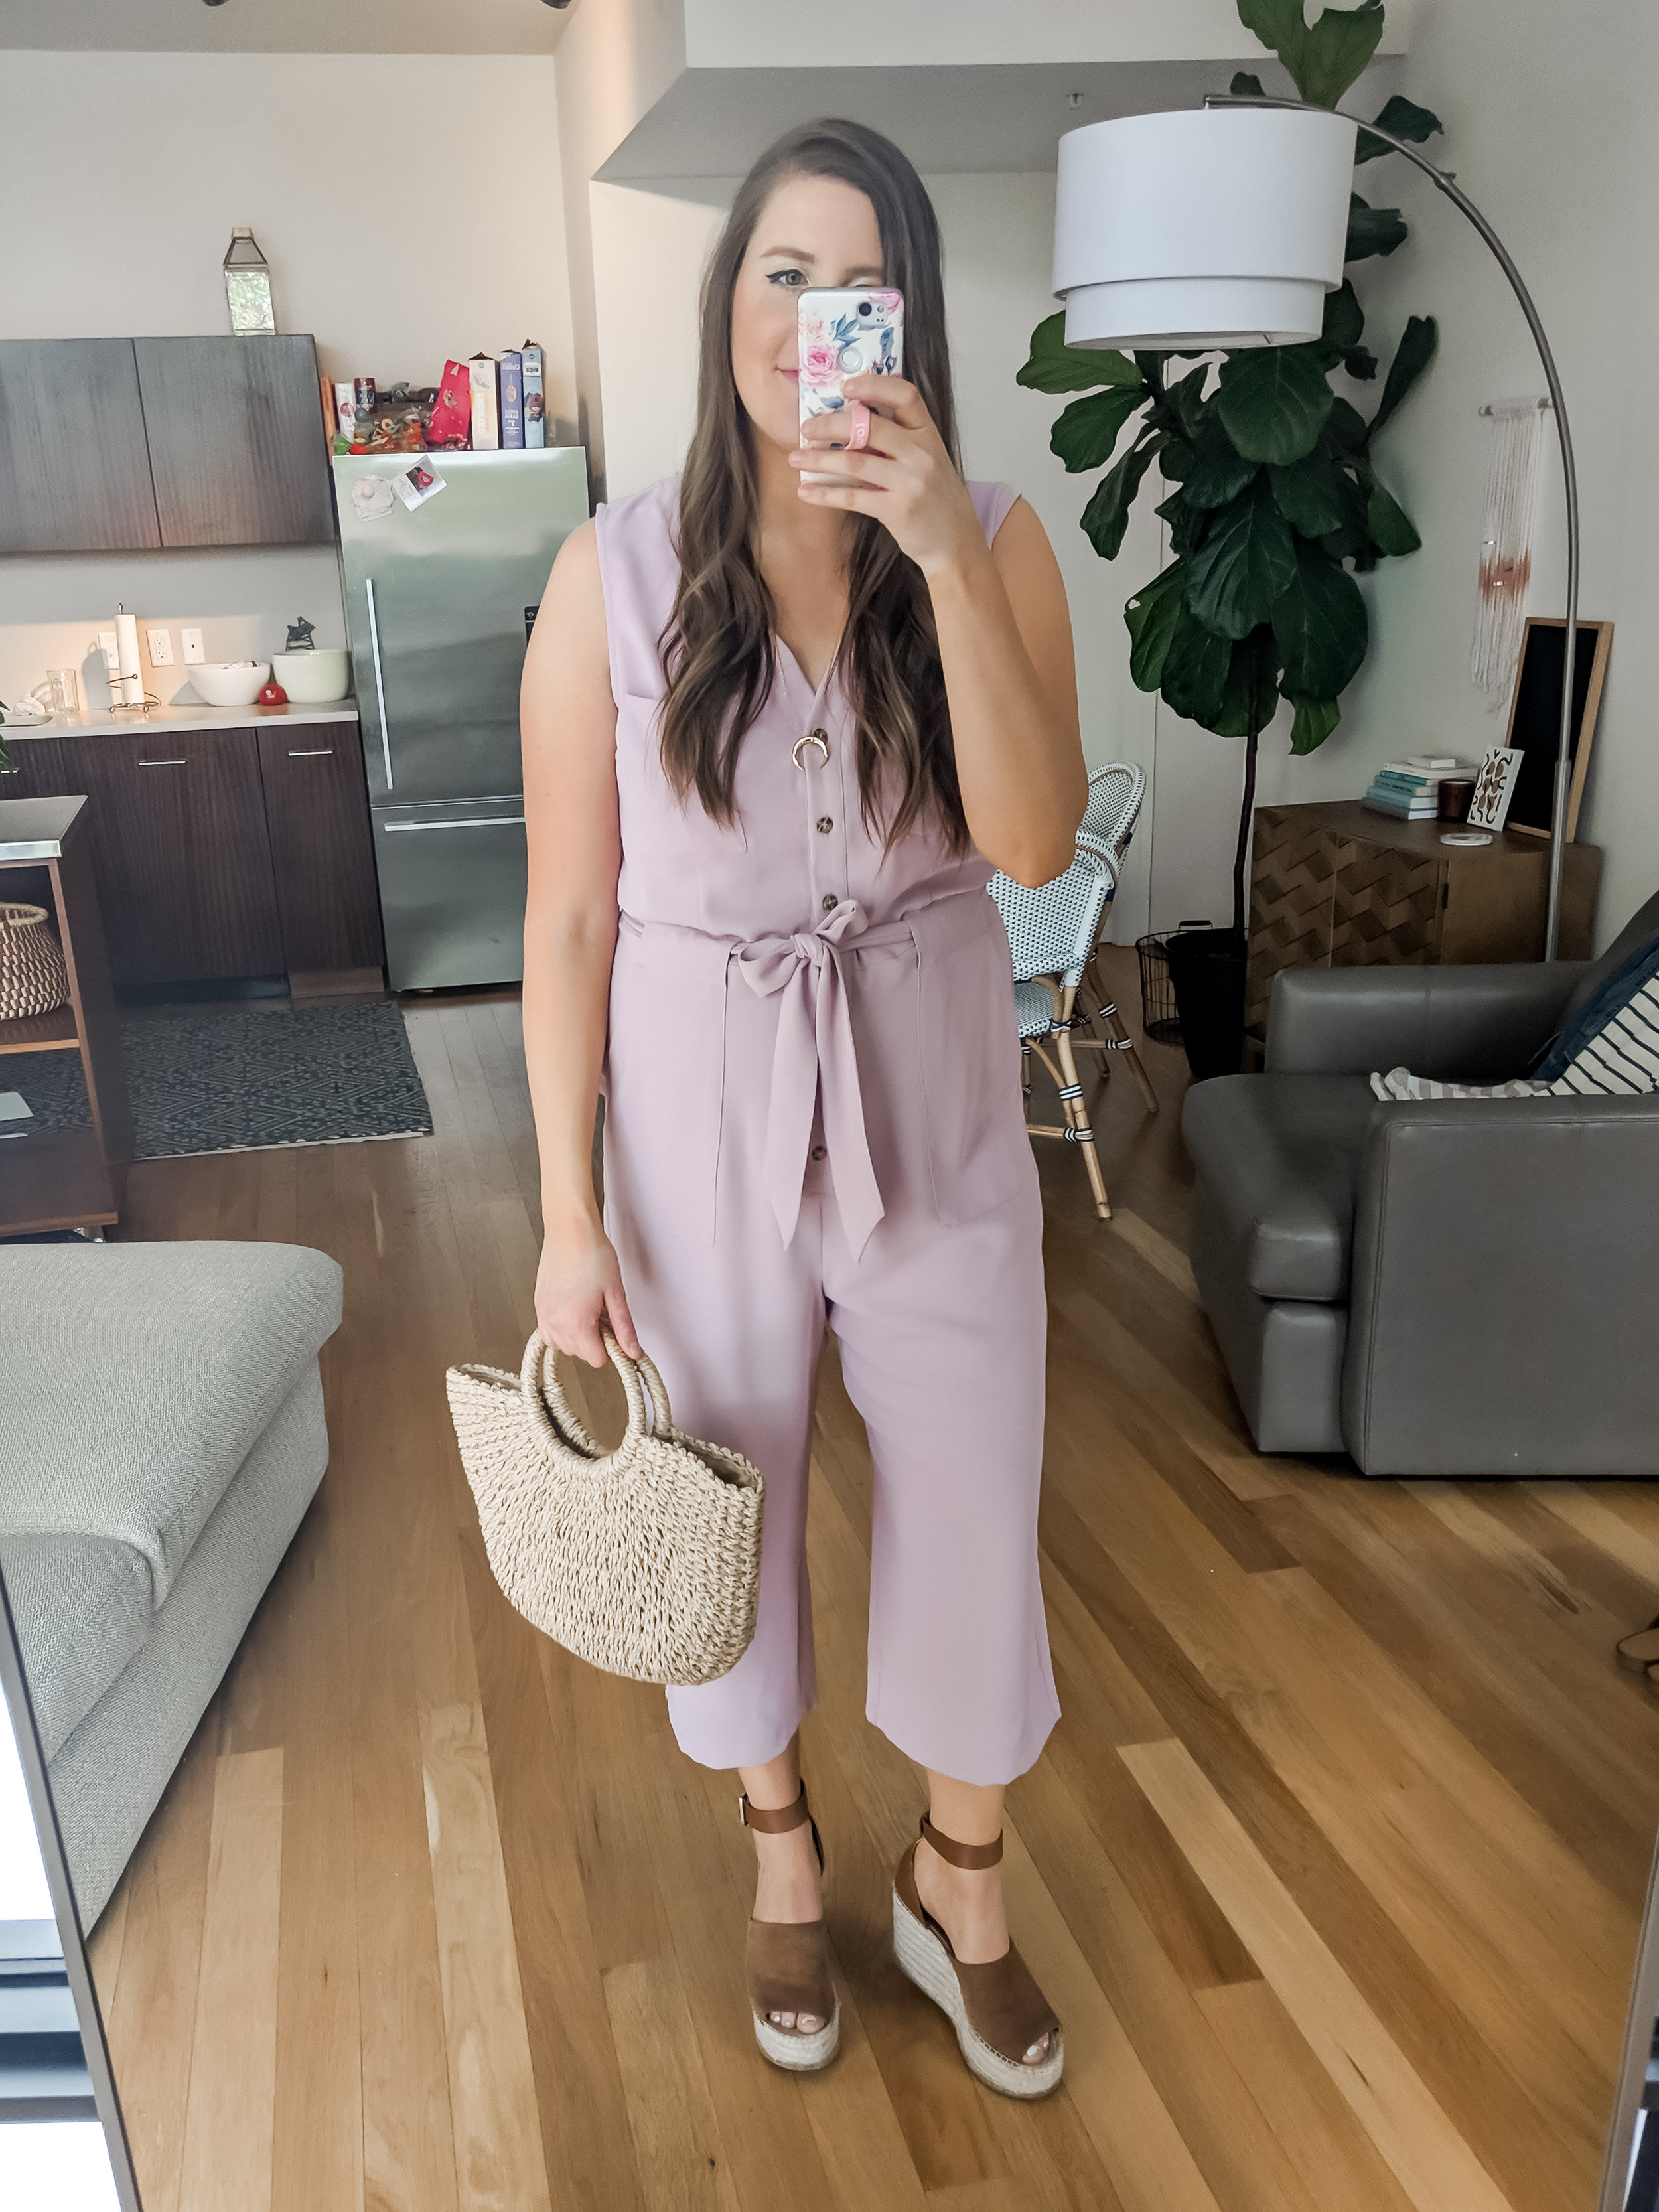 Target Spring Try-On StylebyJulianne